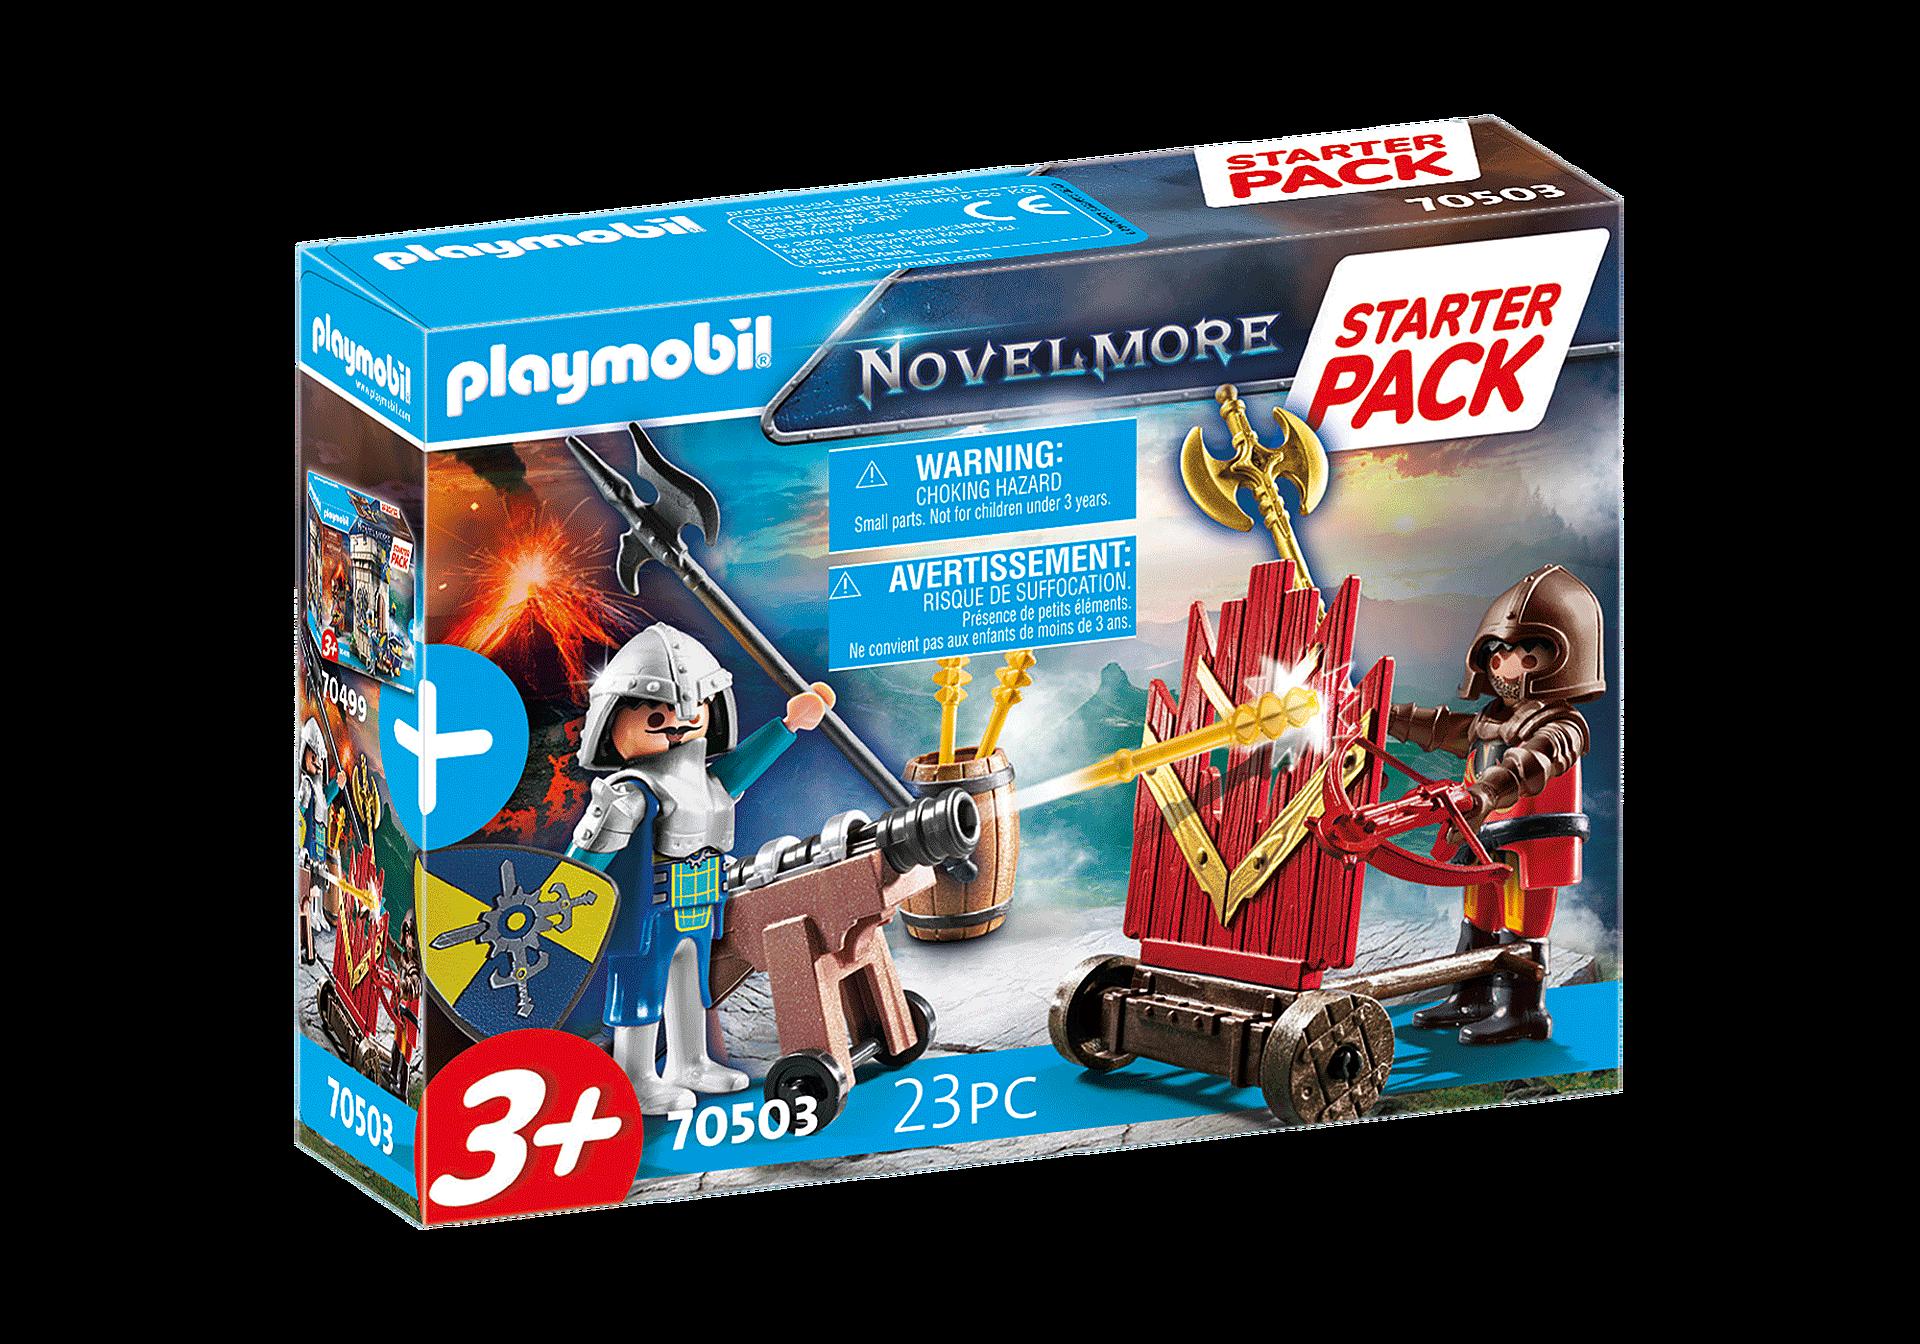 70503 Starter Pack Novelmore - zestaw dodatkowy zoom image2